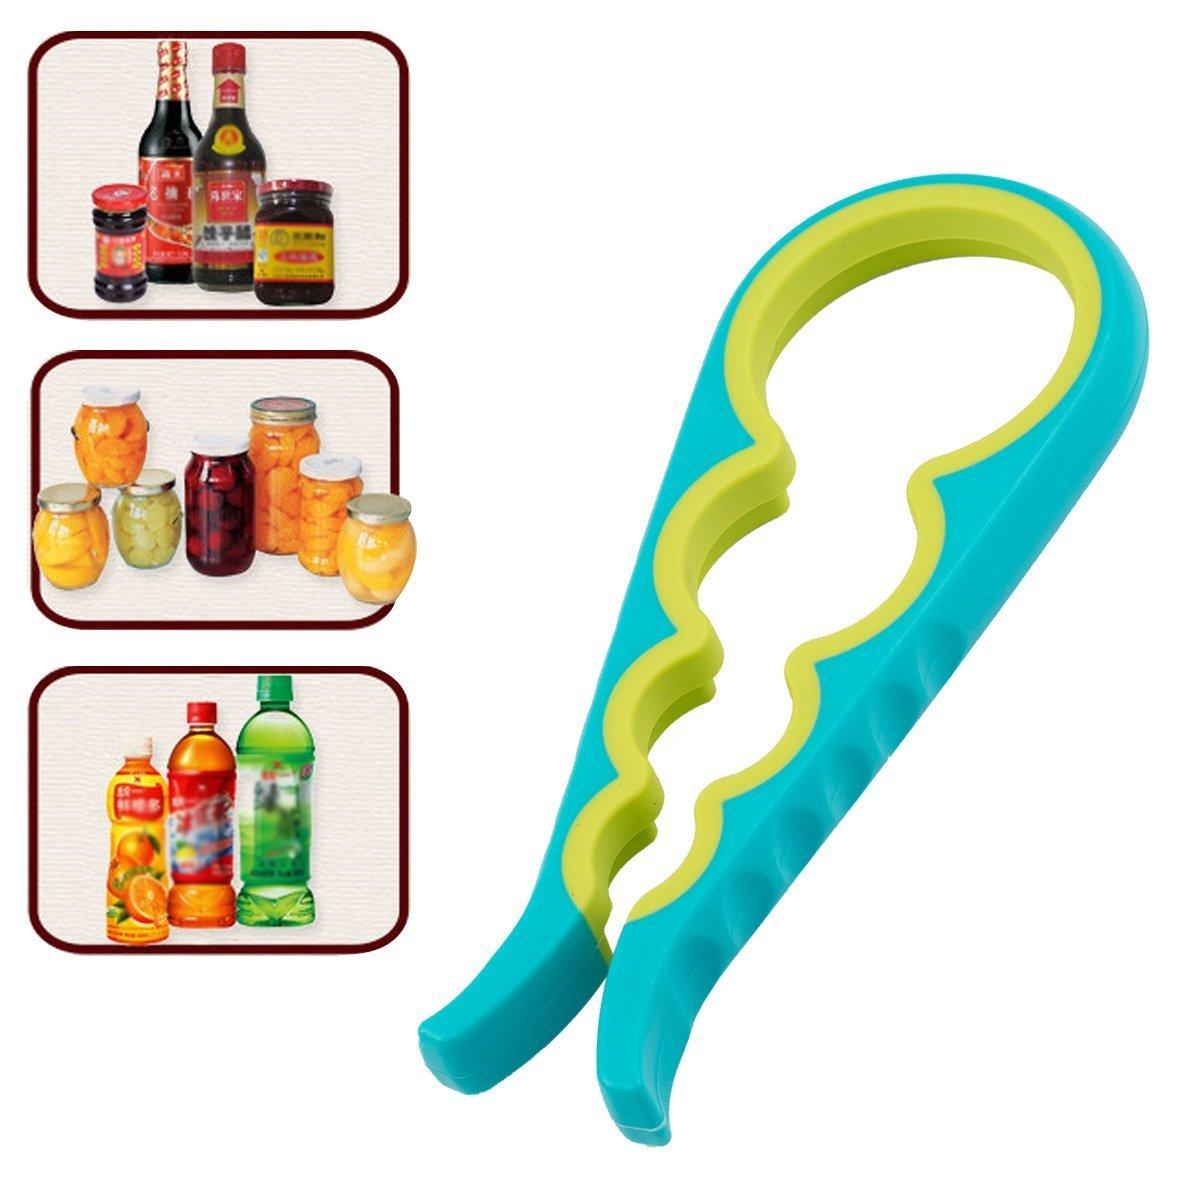 Cool-Shop Premium Easy Grip Jar Opener Product Review